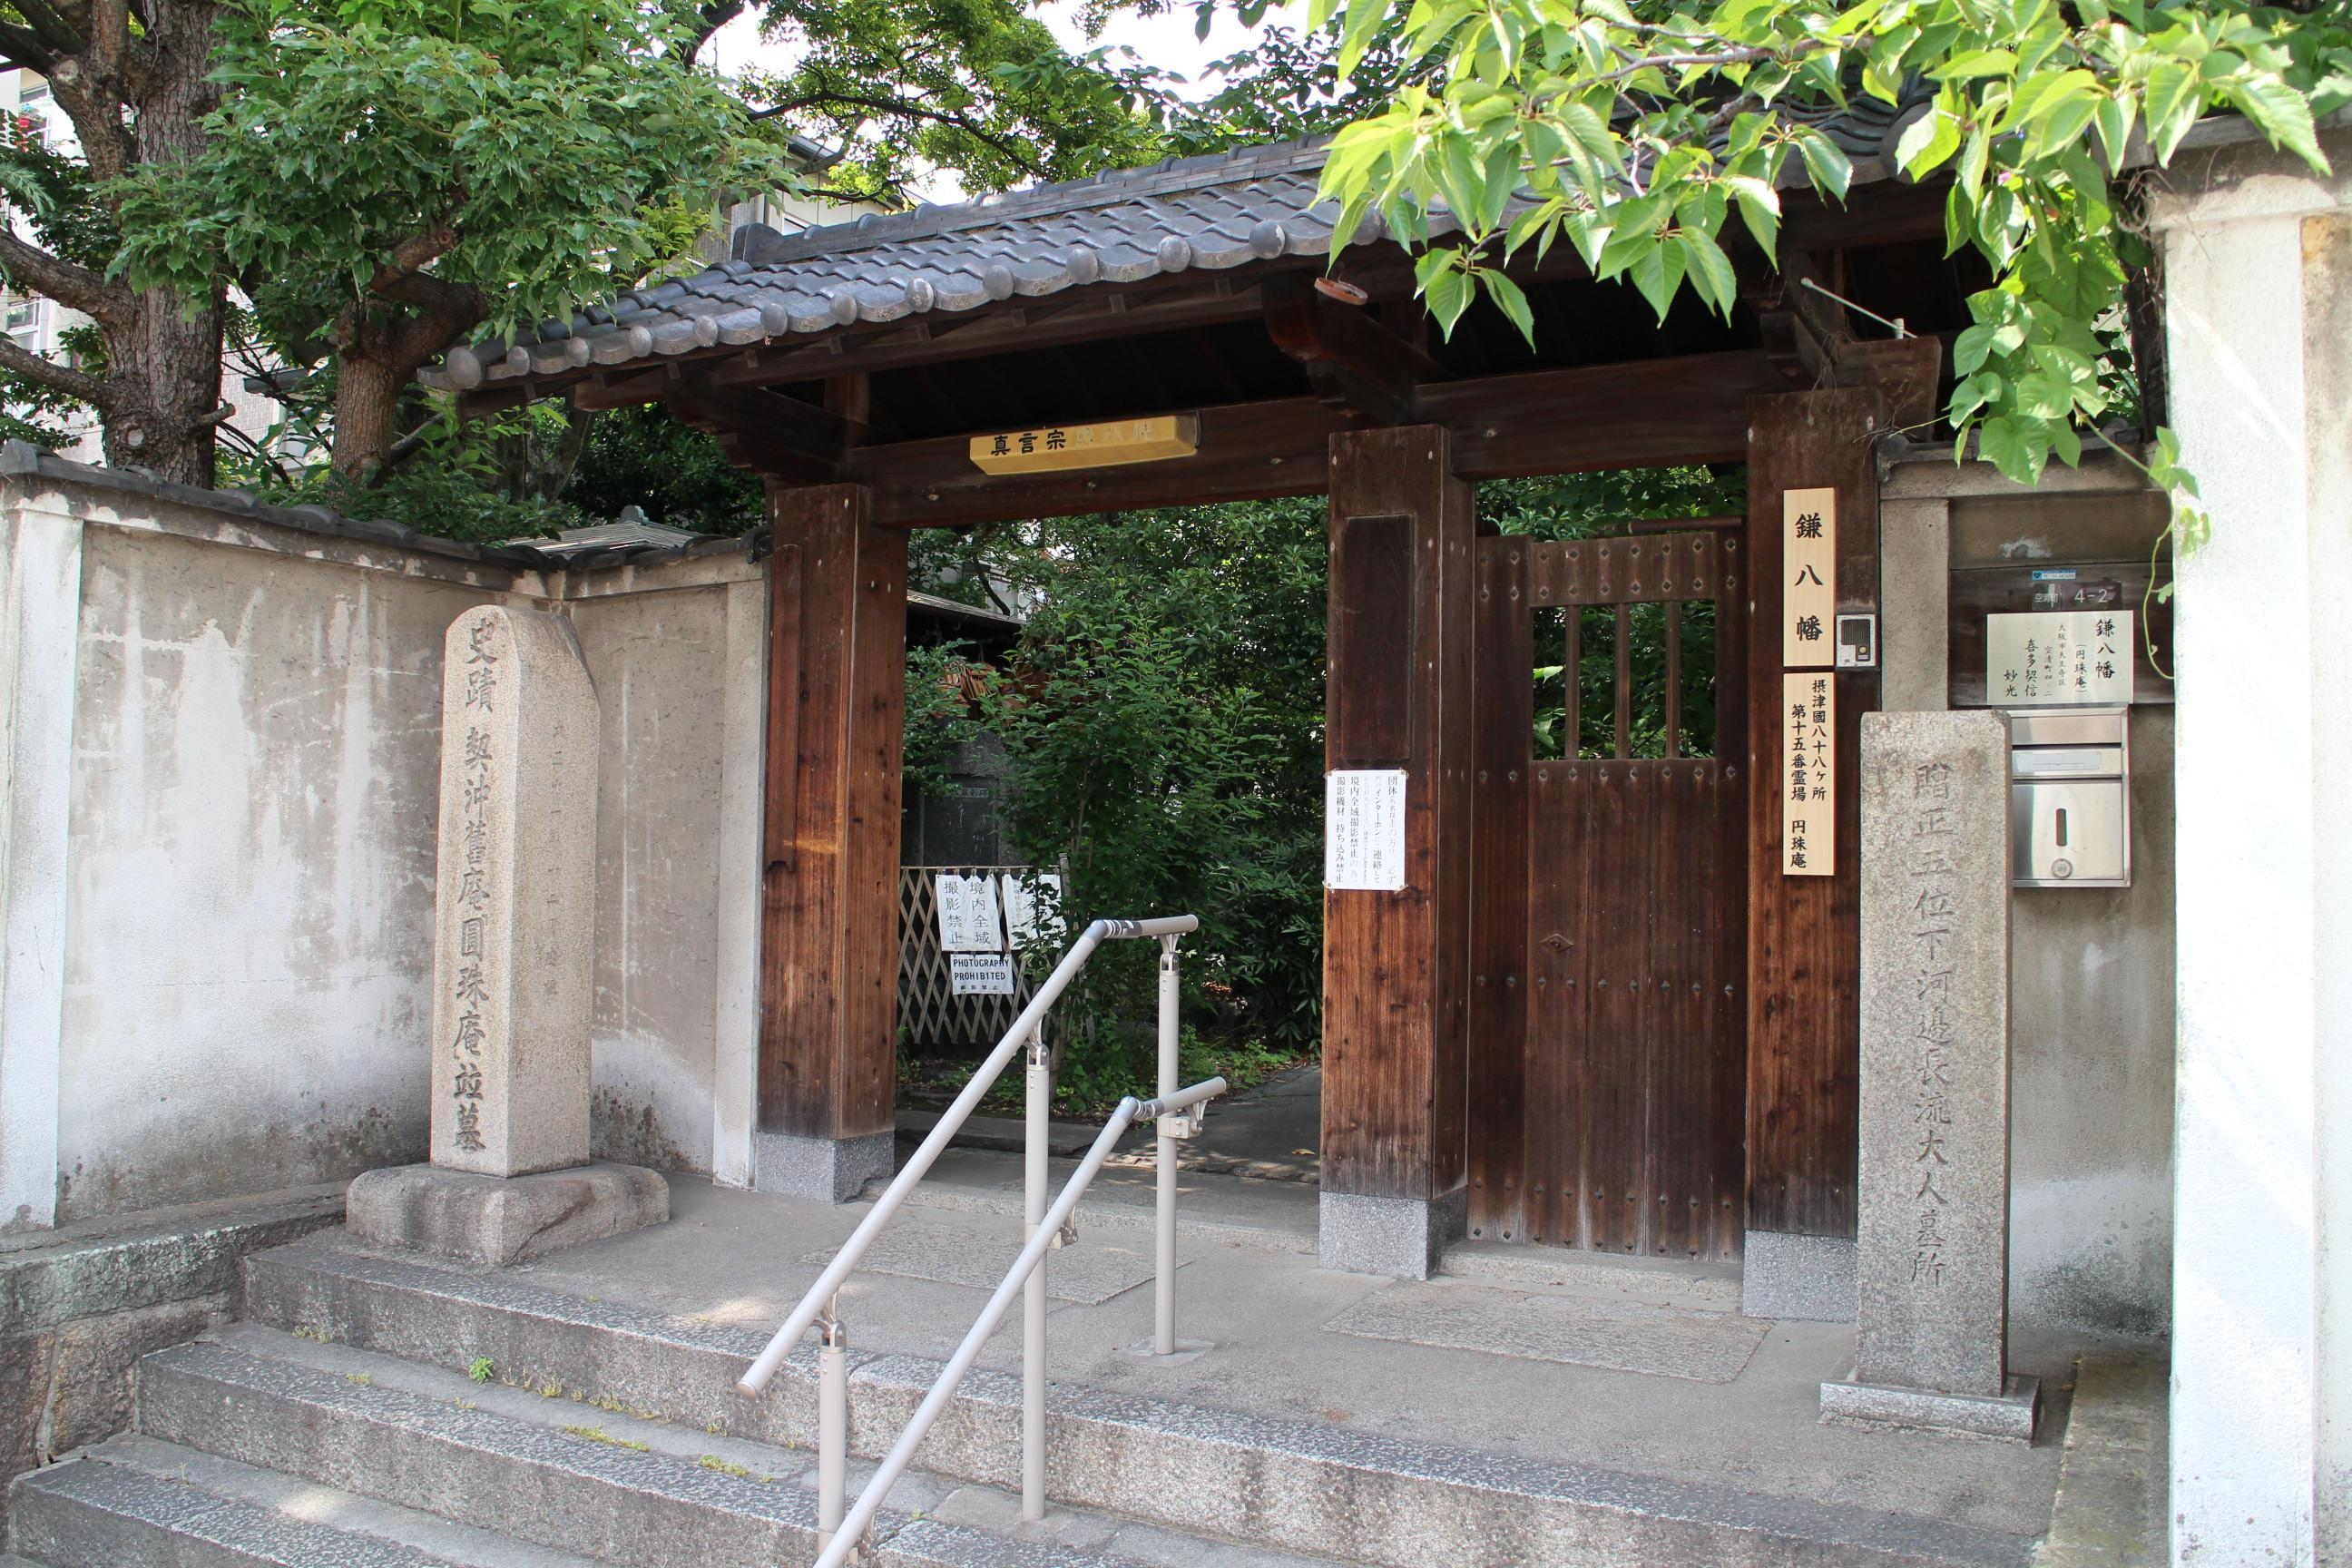 円珠庵(鎌八幡)の山門